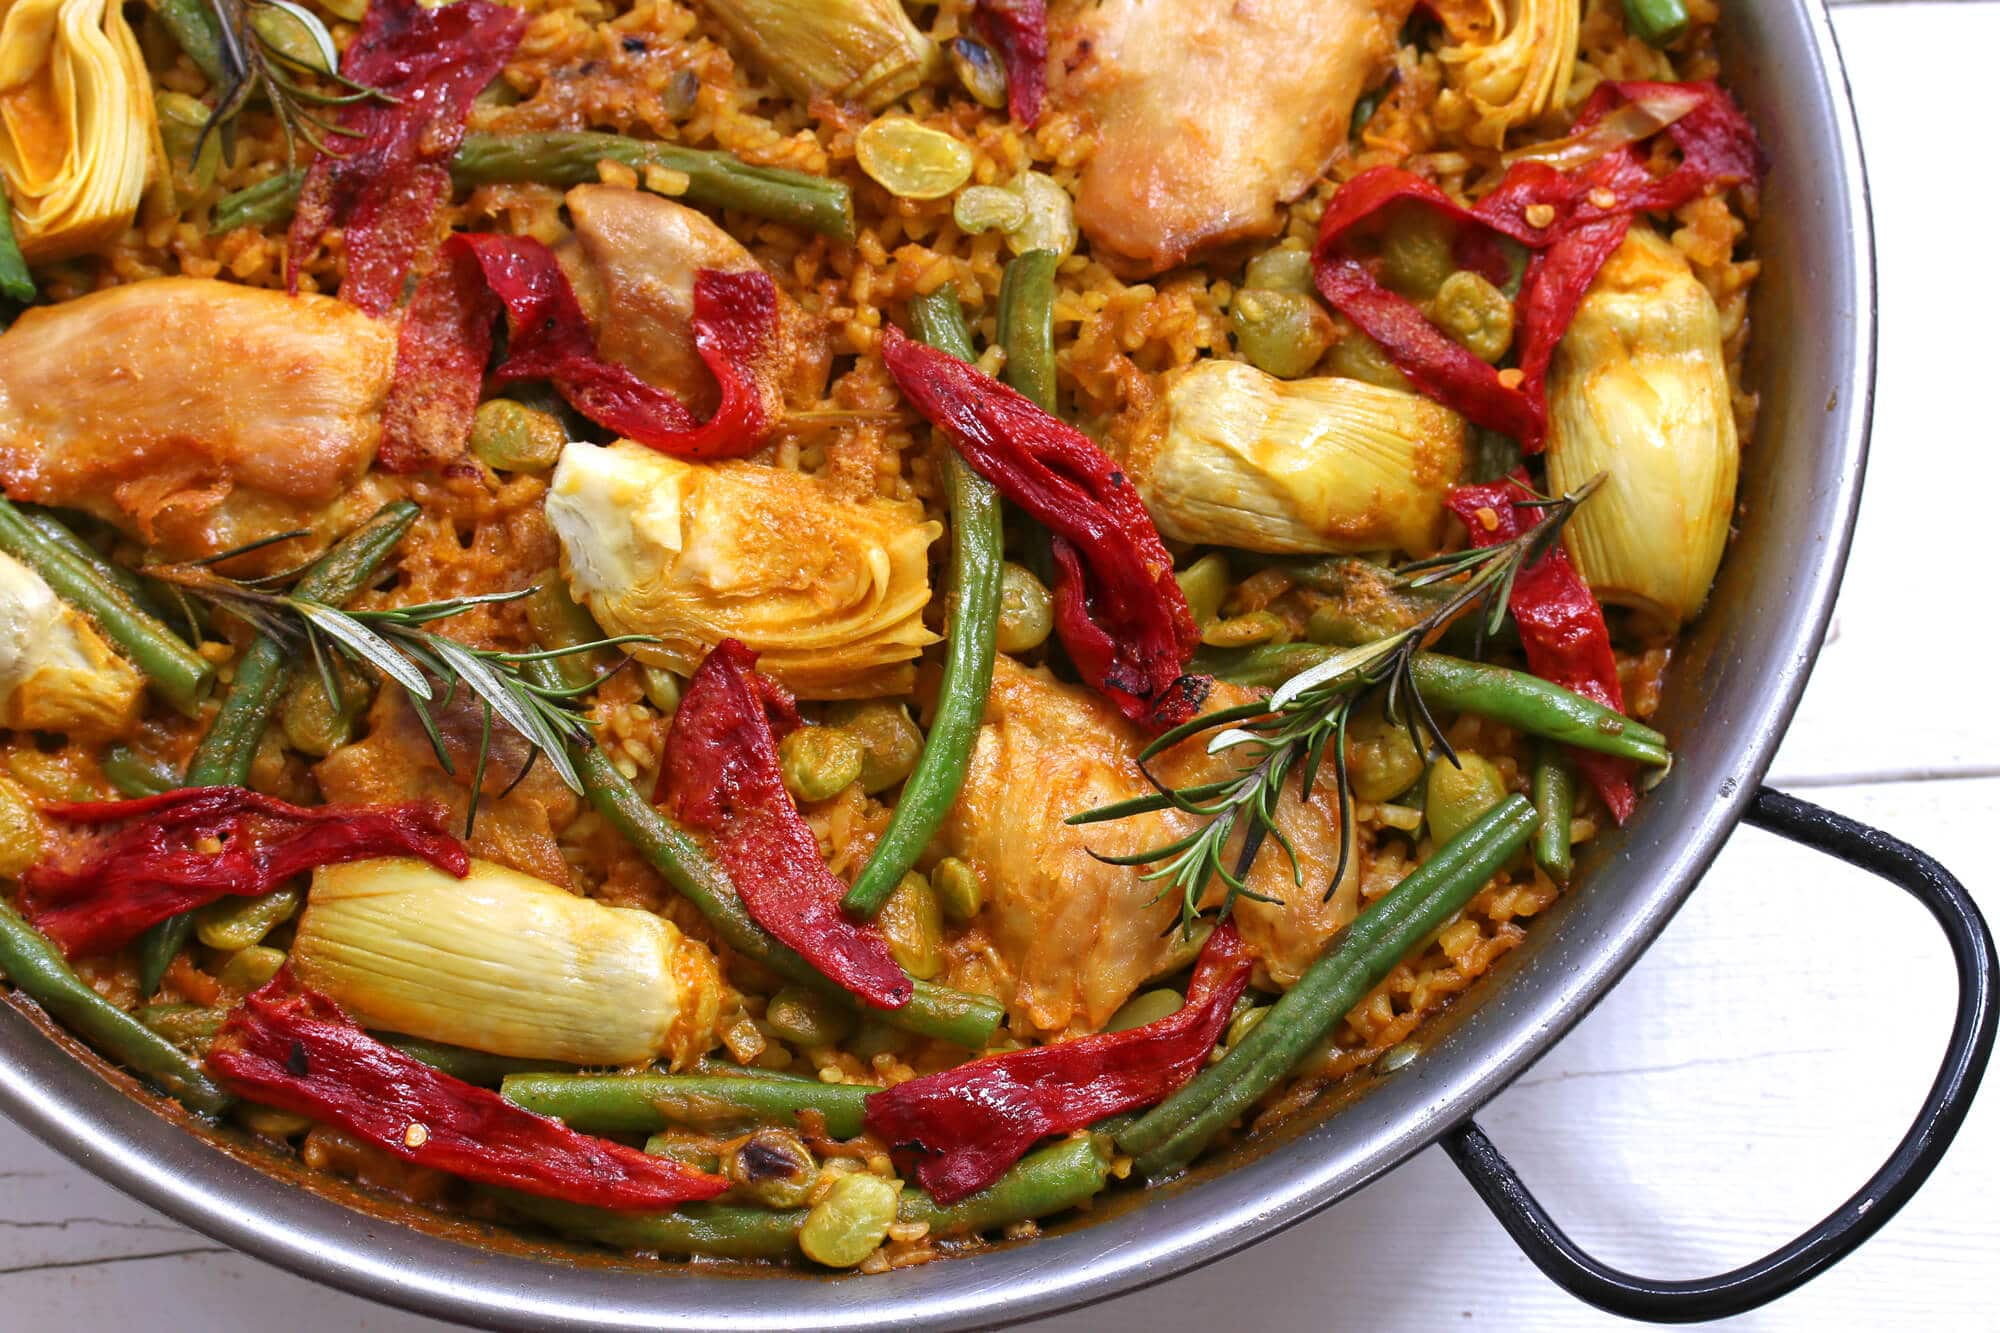 Easy recipe for paella valenciana